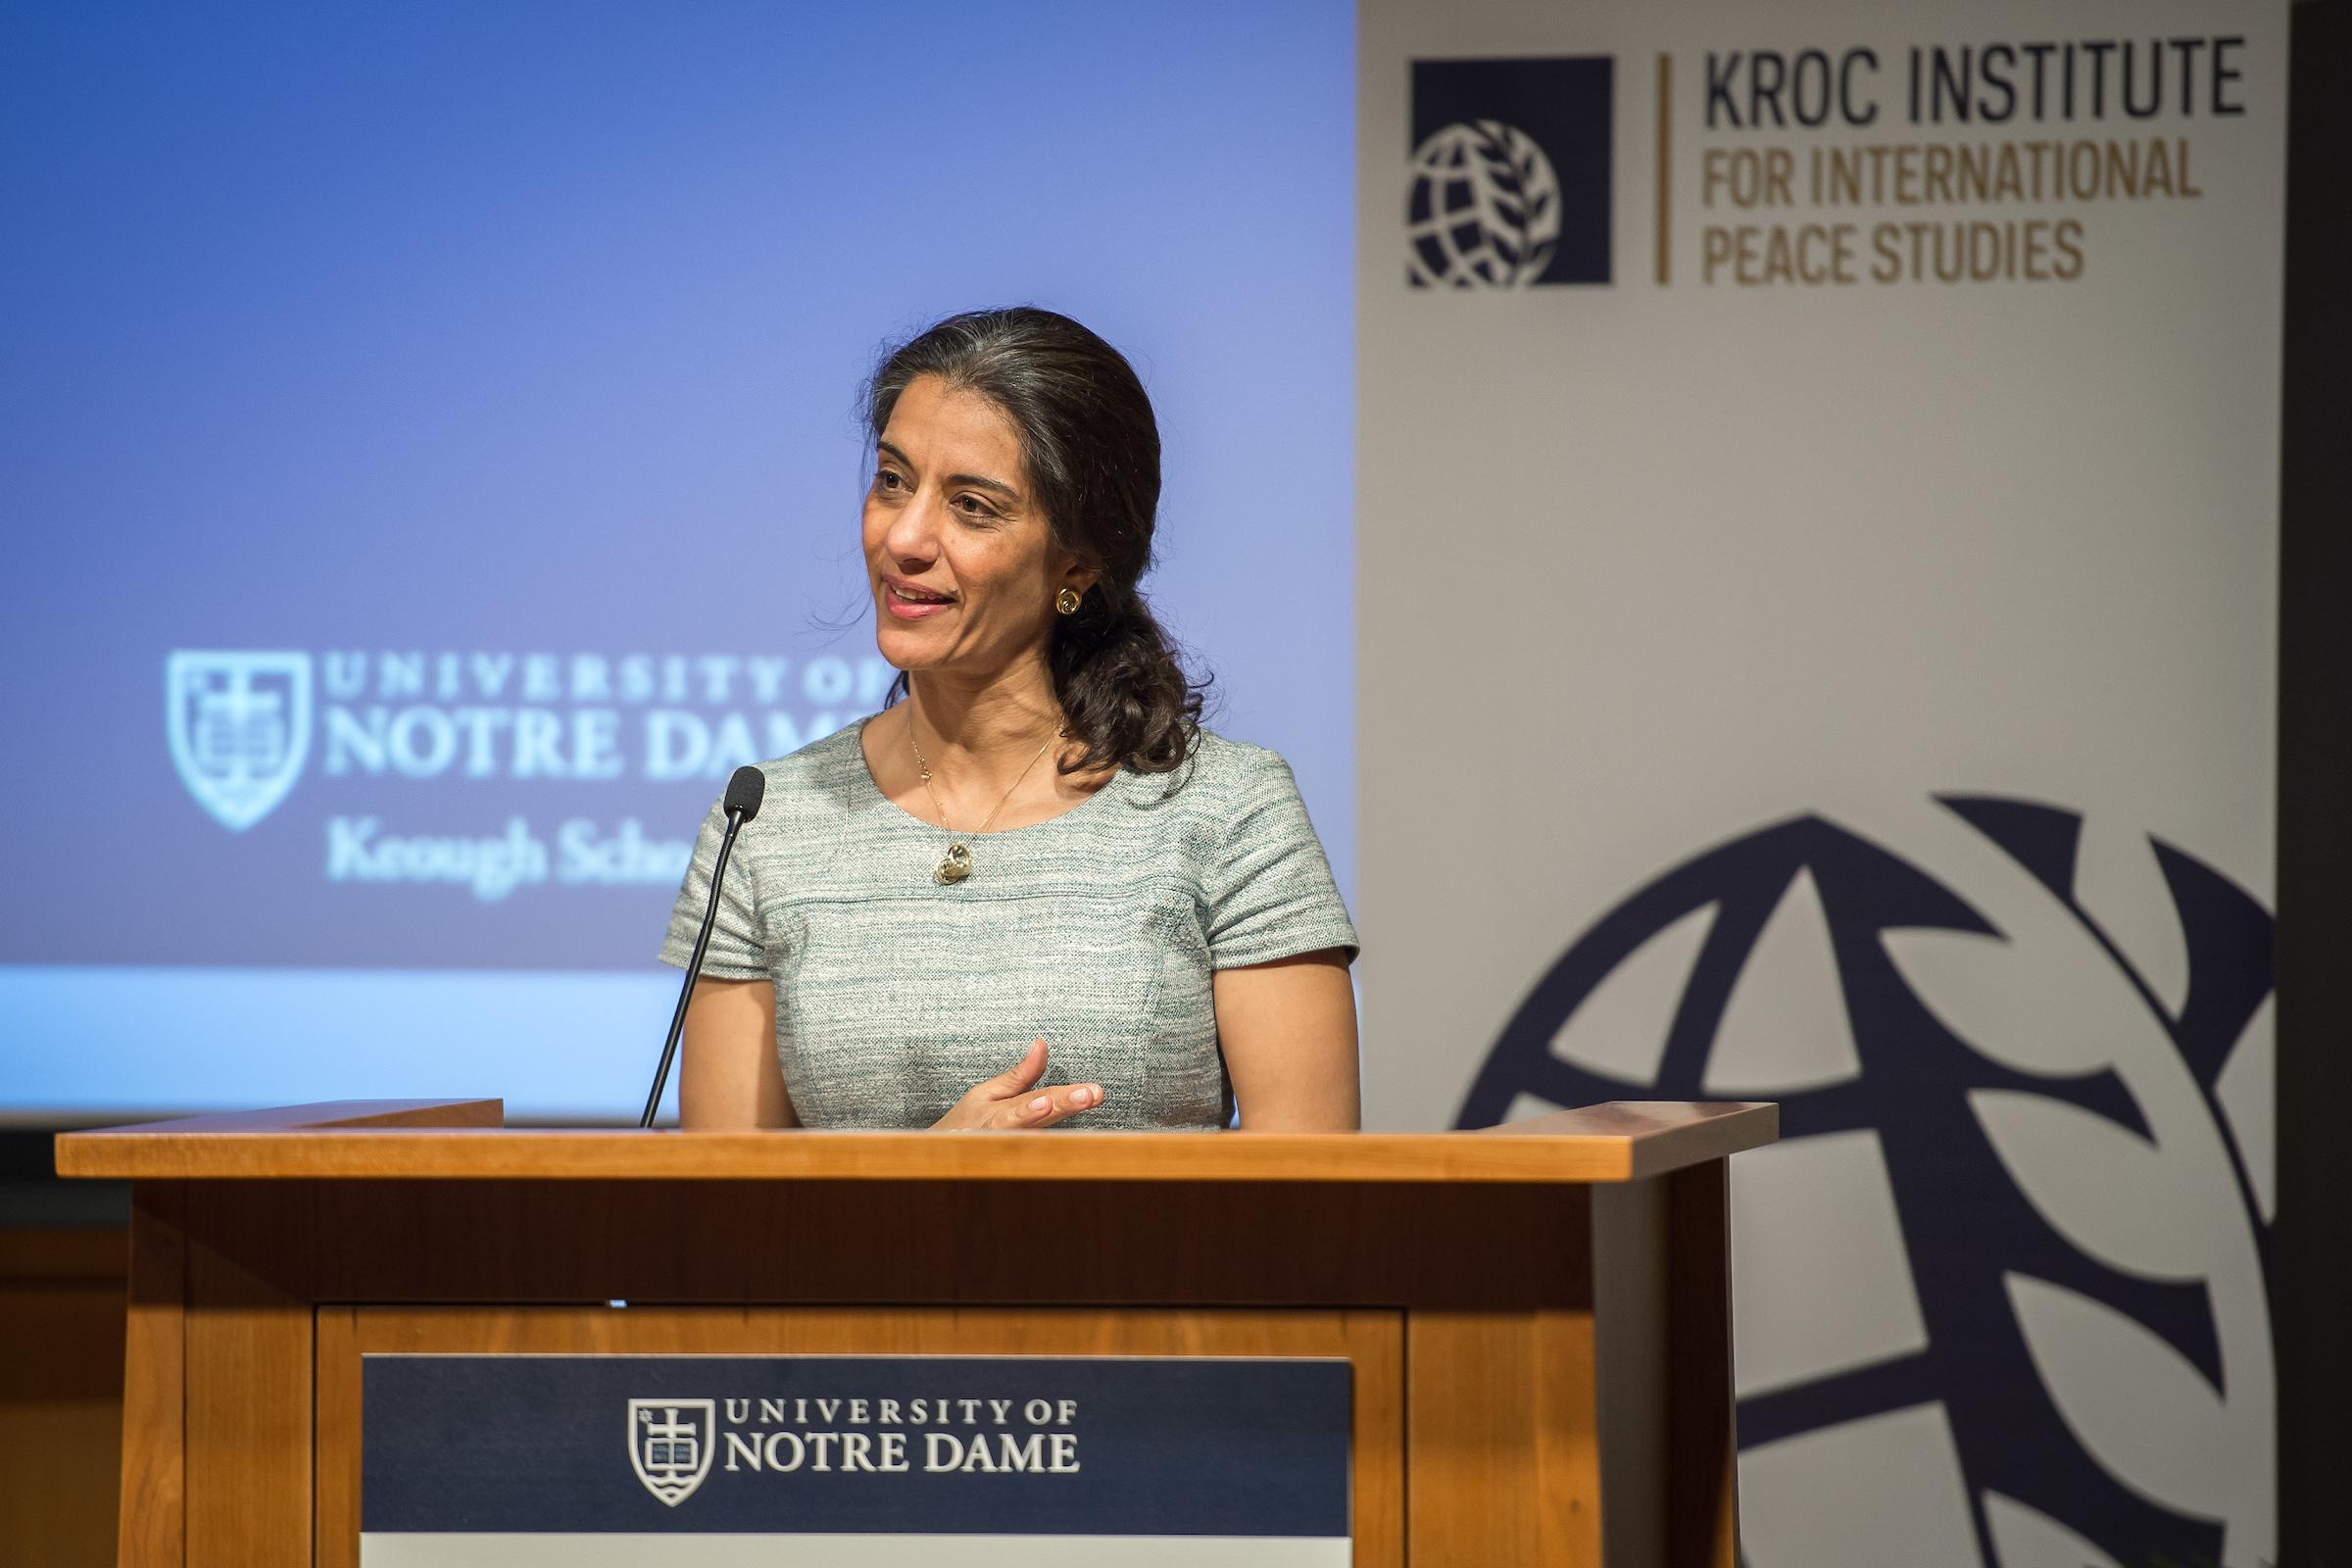 Sanam Naraghi-Anderlinin speaks at the podium